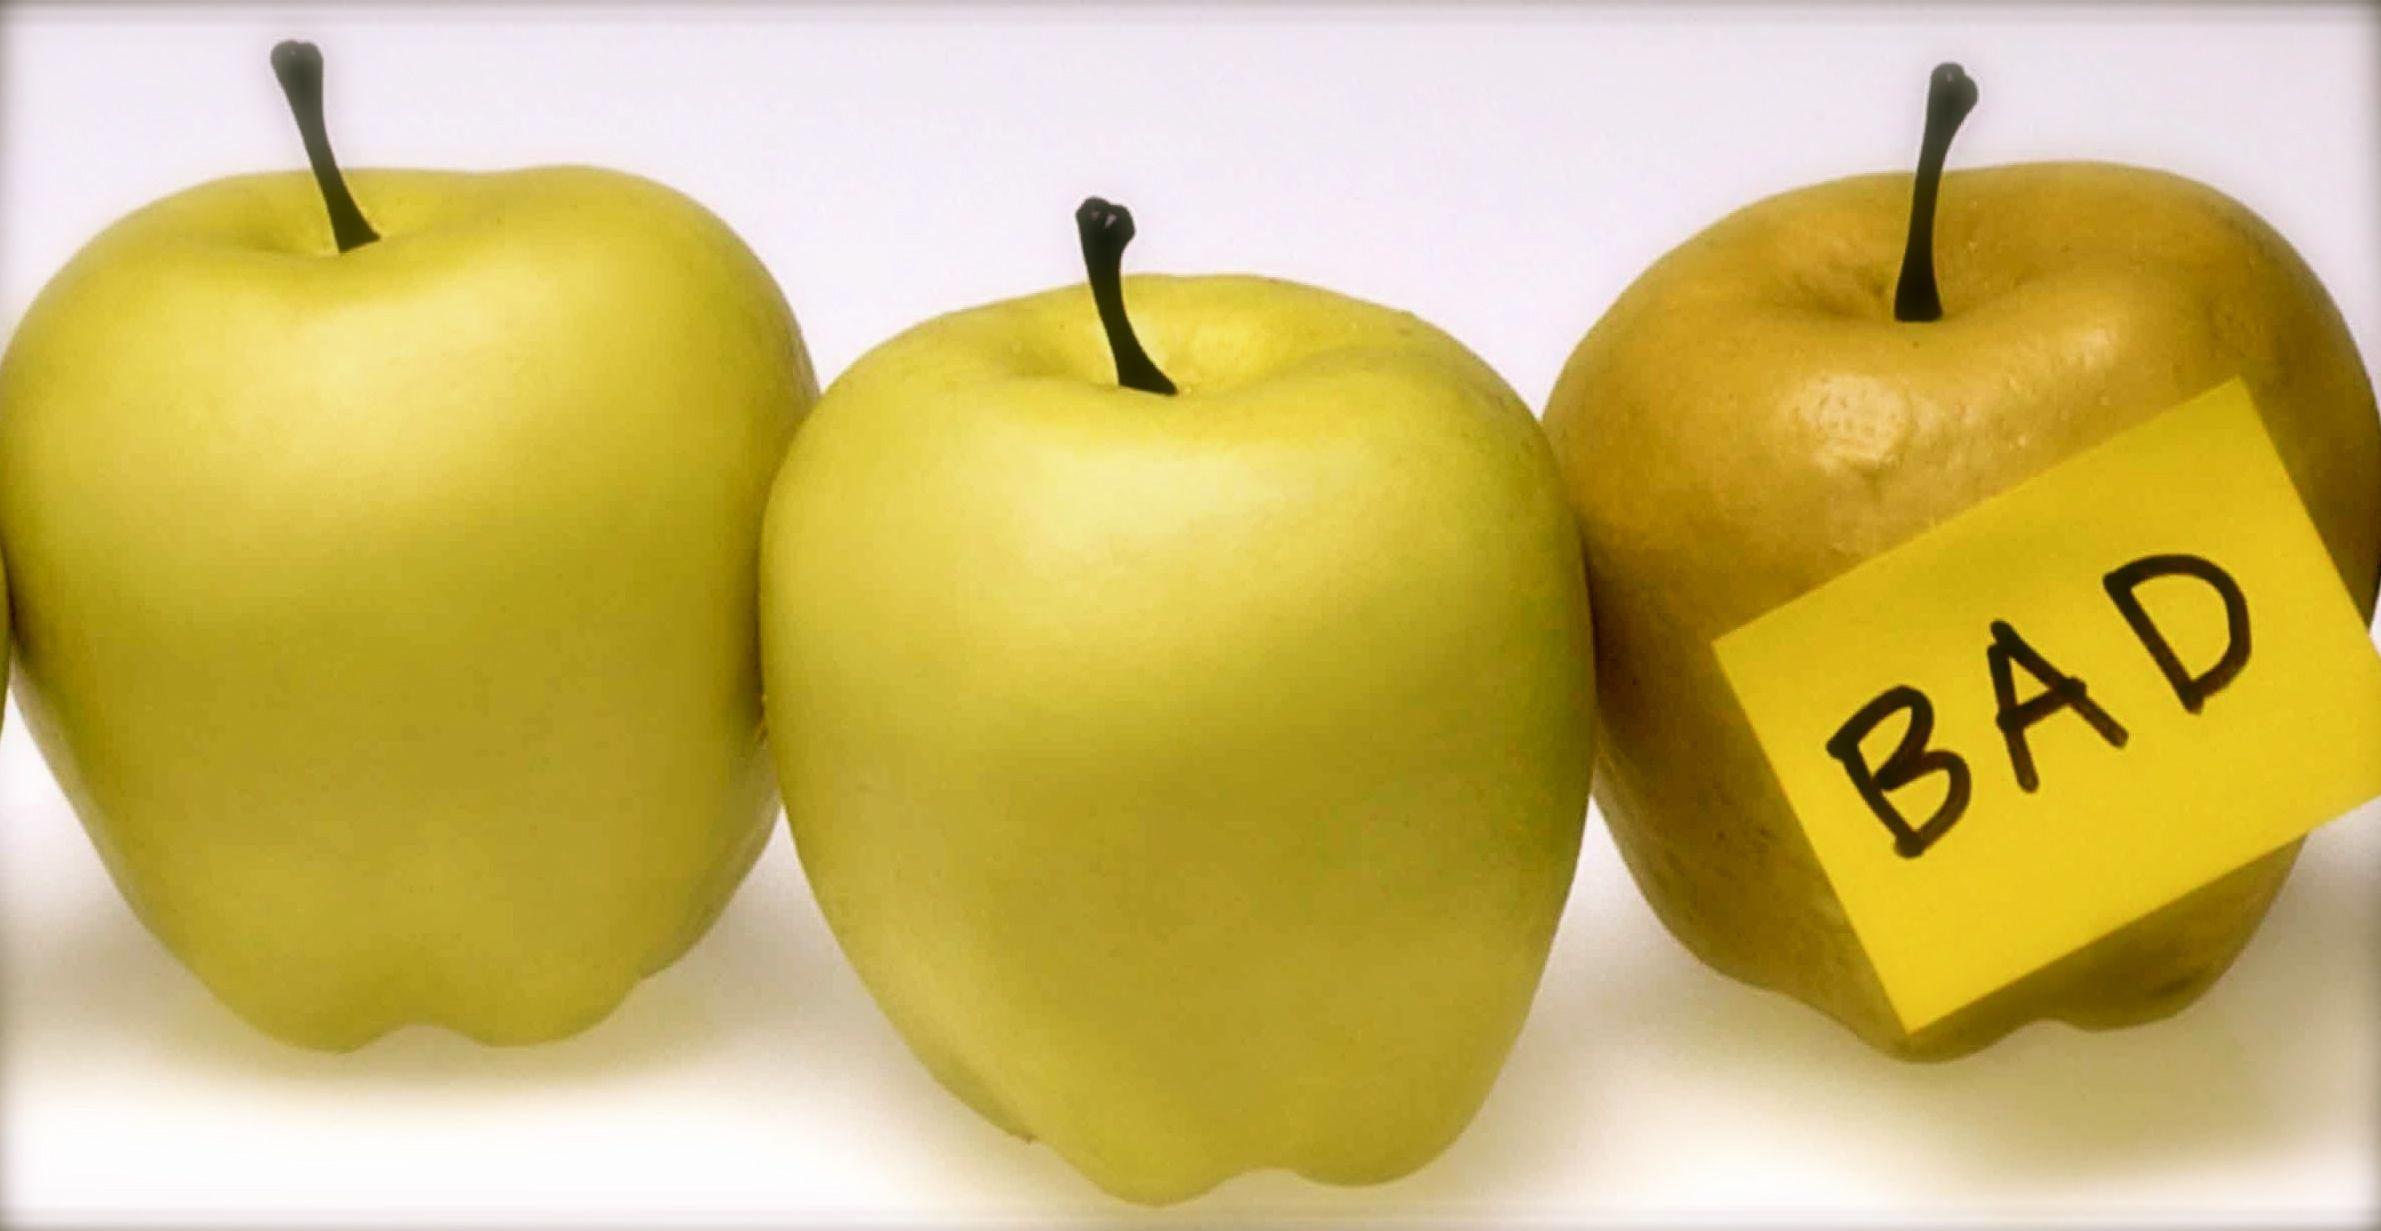 Season's Gifting Starts With Award-Winning Caramel Apples, Gourmet Gifts & Belgian Chocolates!